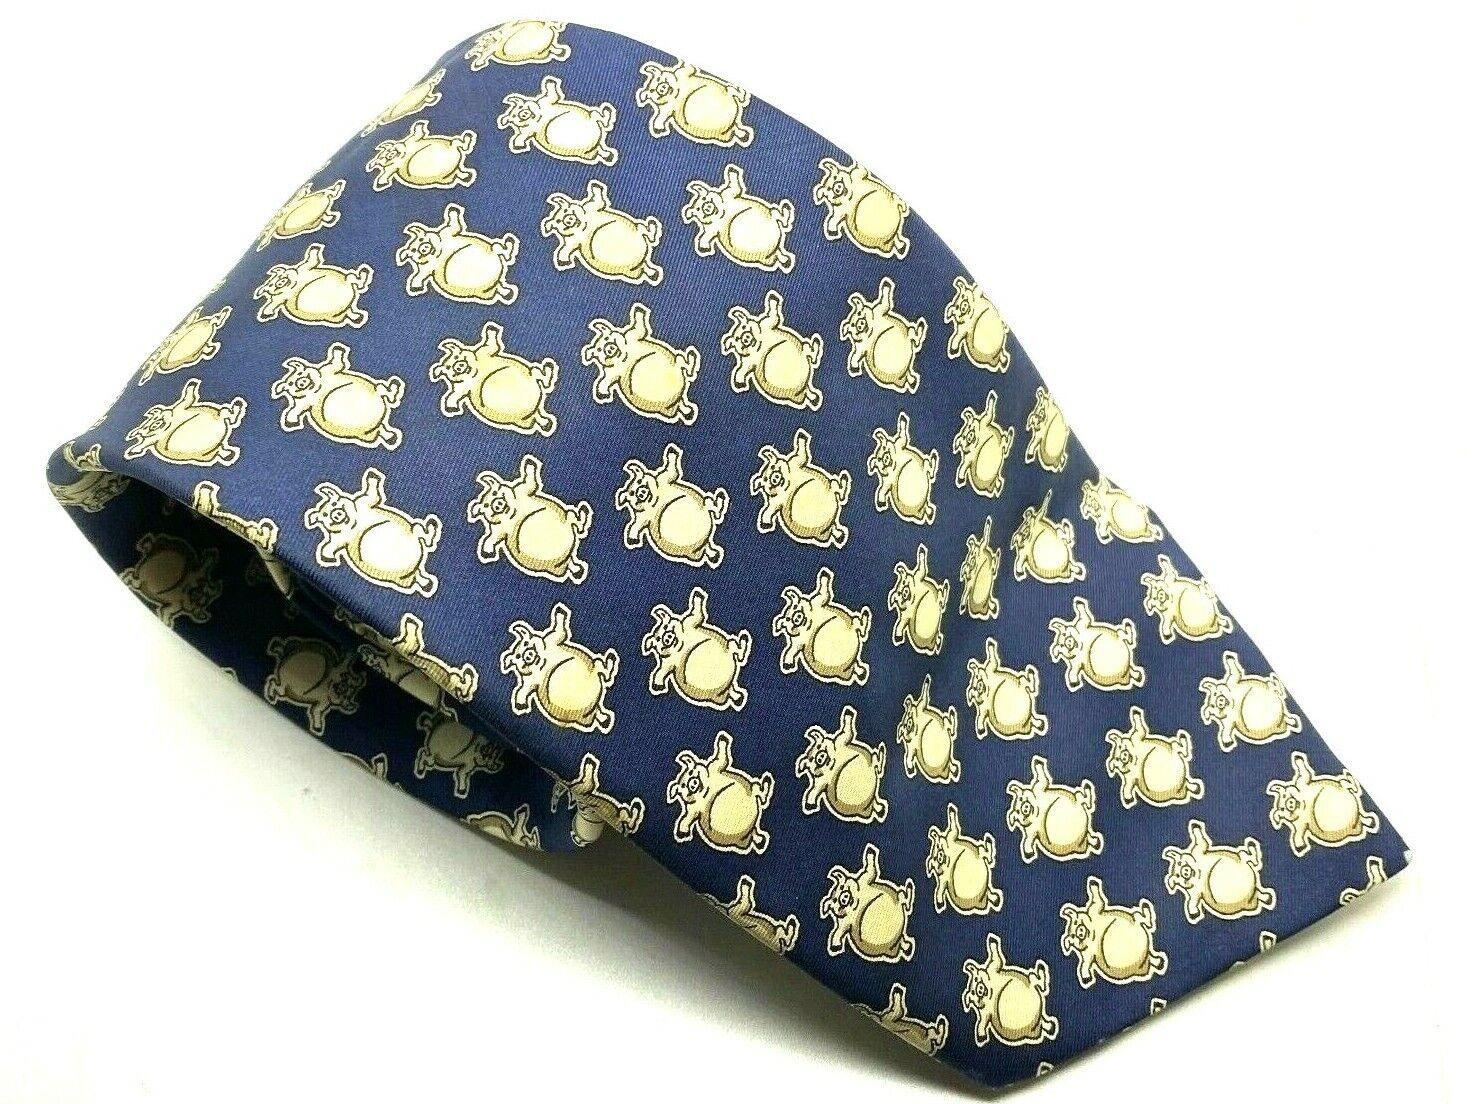 "PIGS BHS Men's Tie Fun Blue Novelty Polyester 3.75"" Width 59"